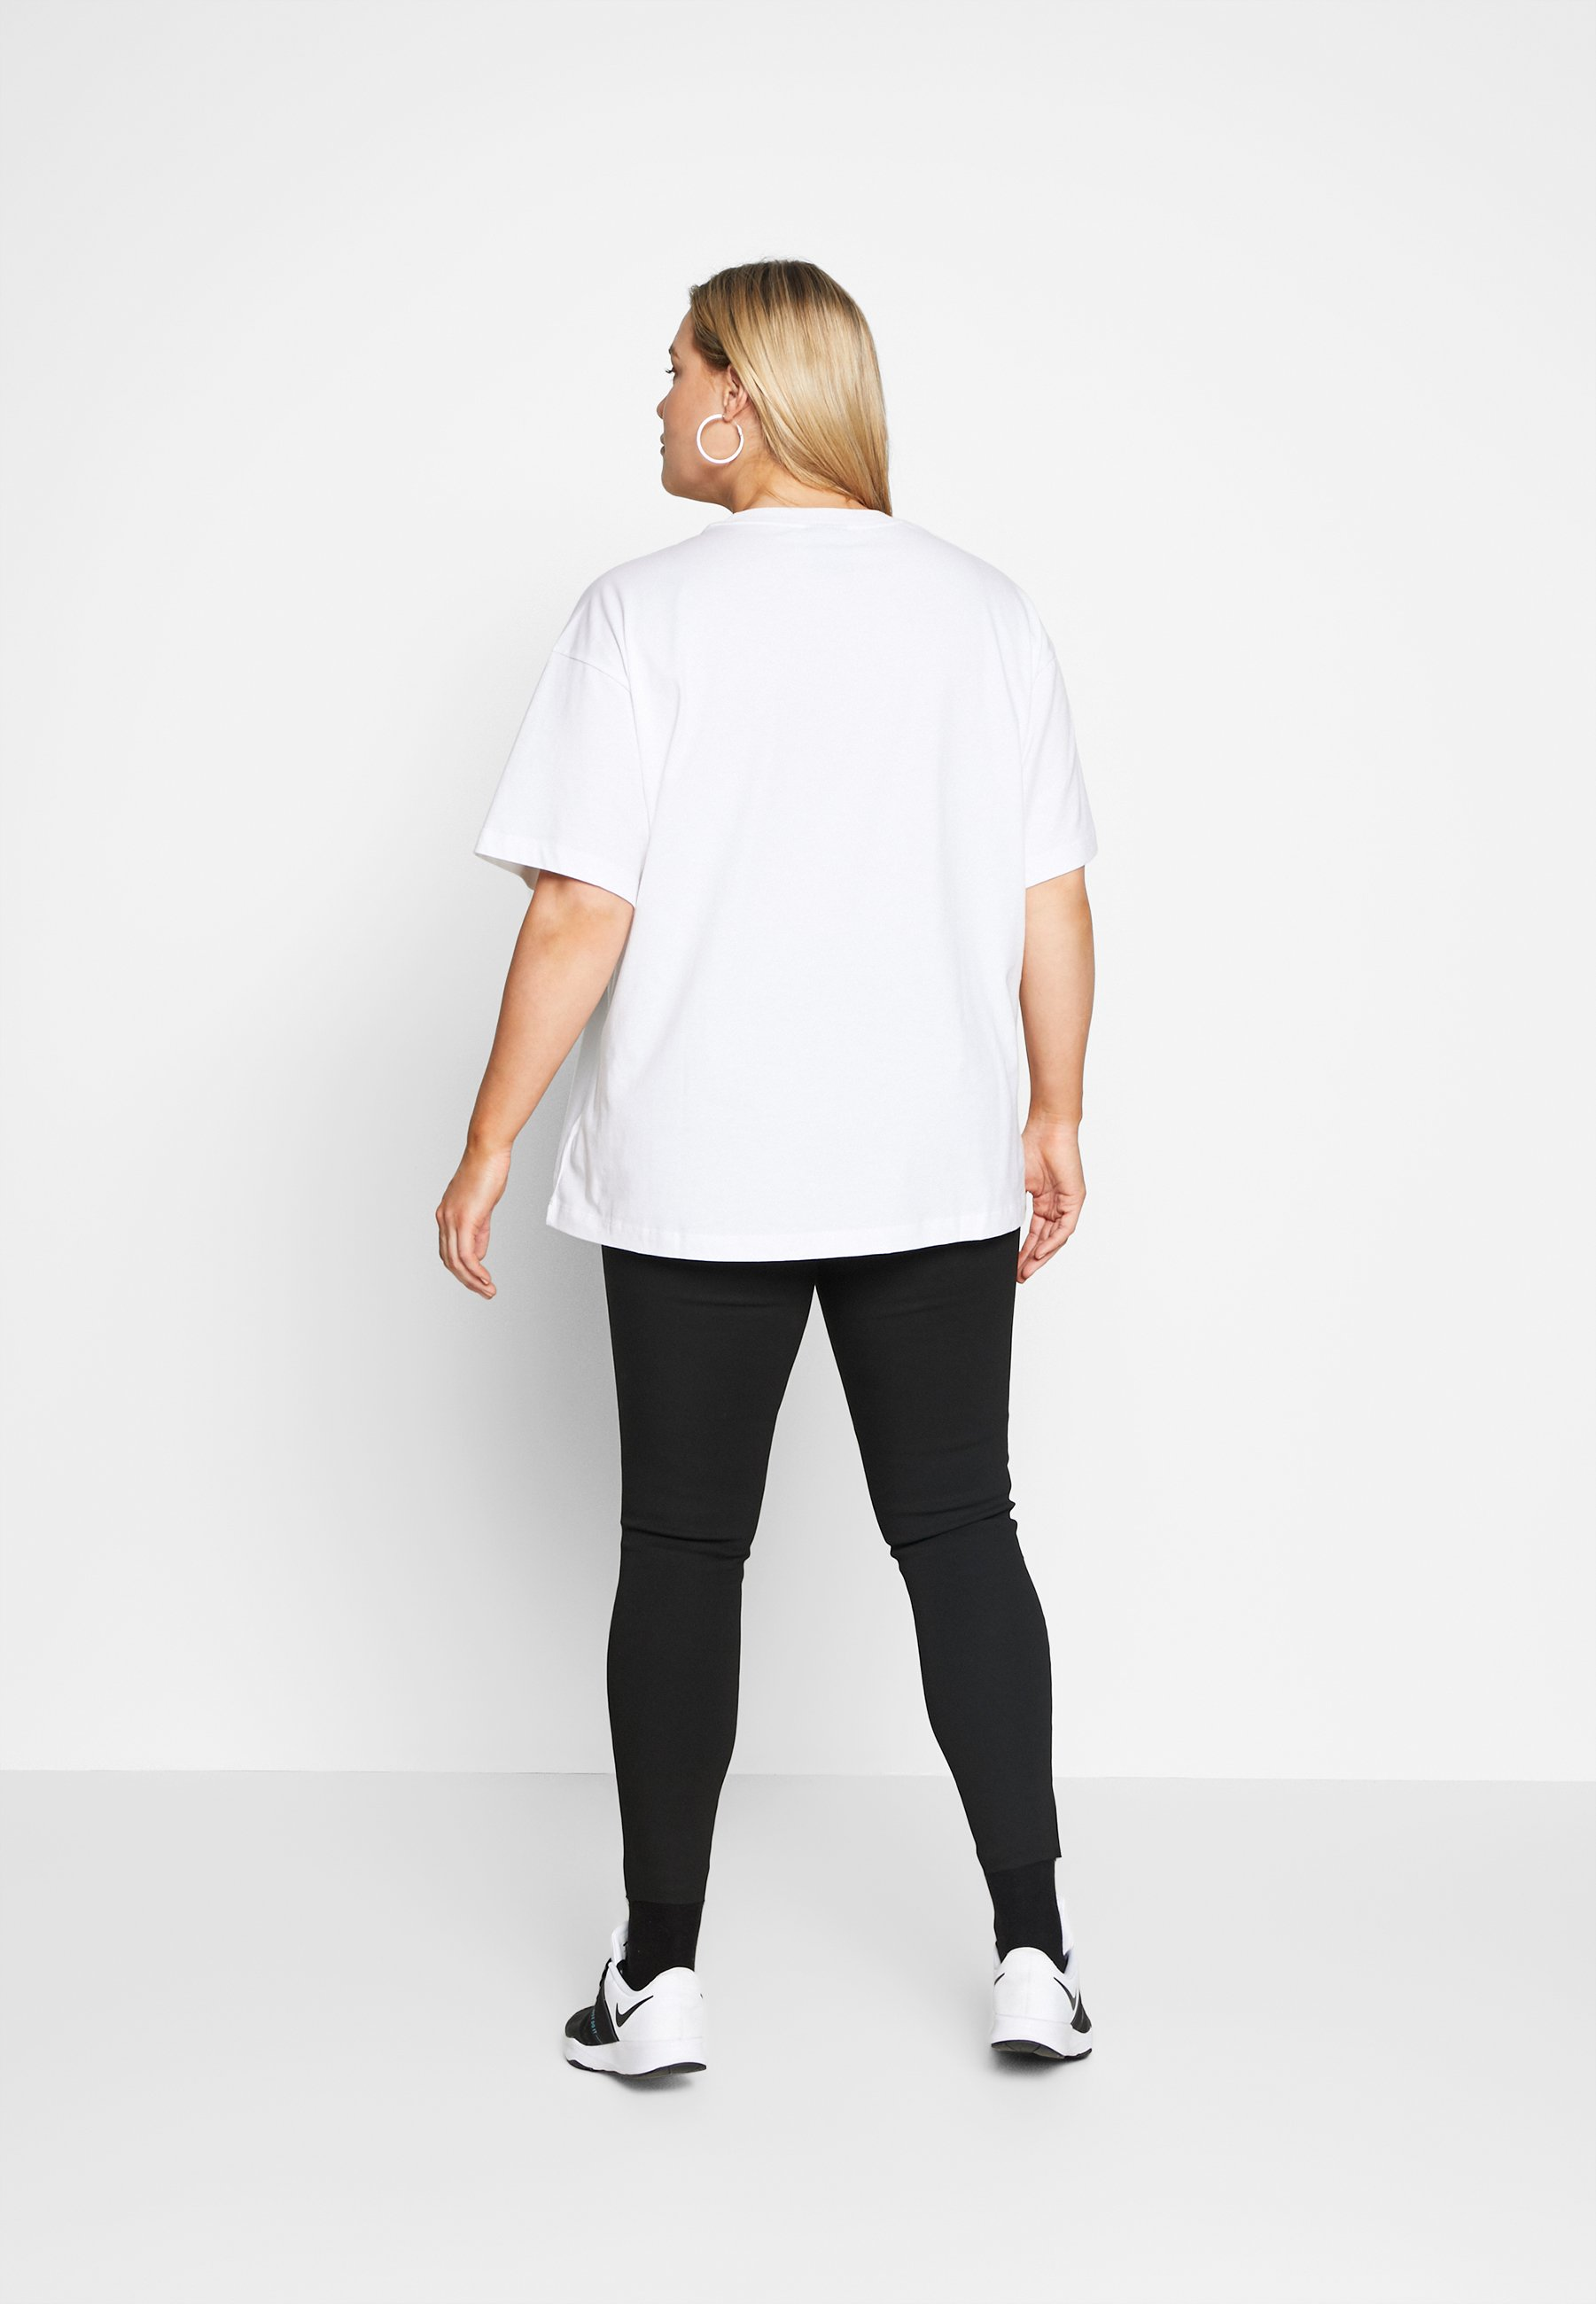 Nike Sportswear T-shirts - white/black